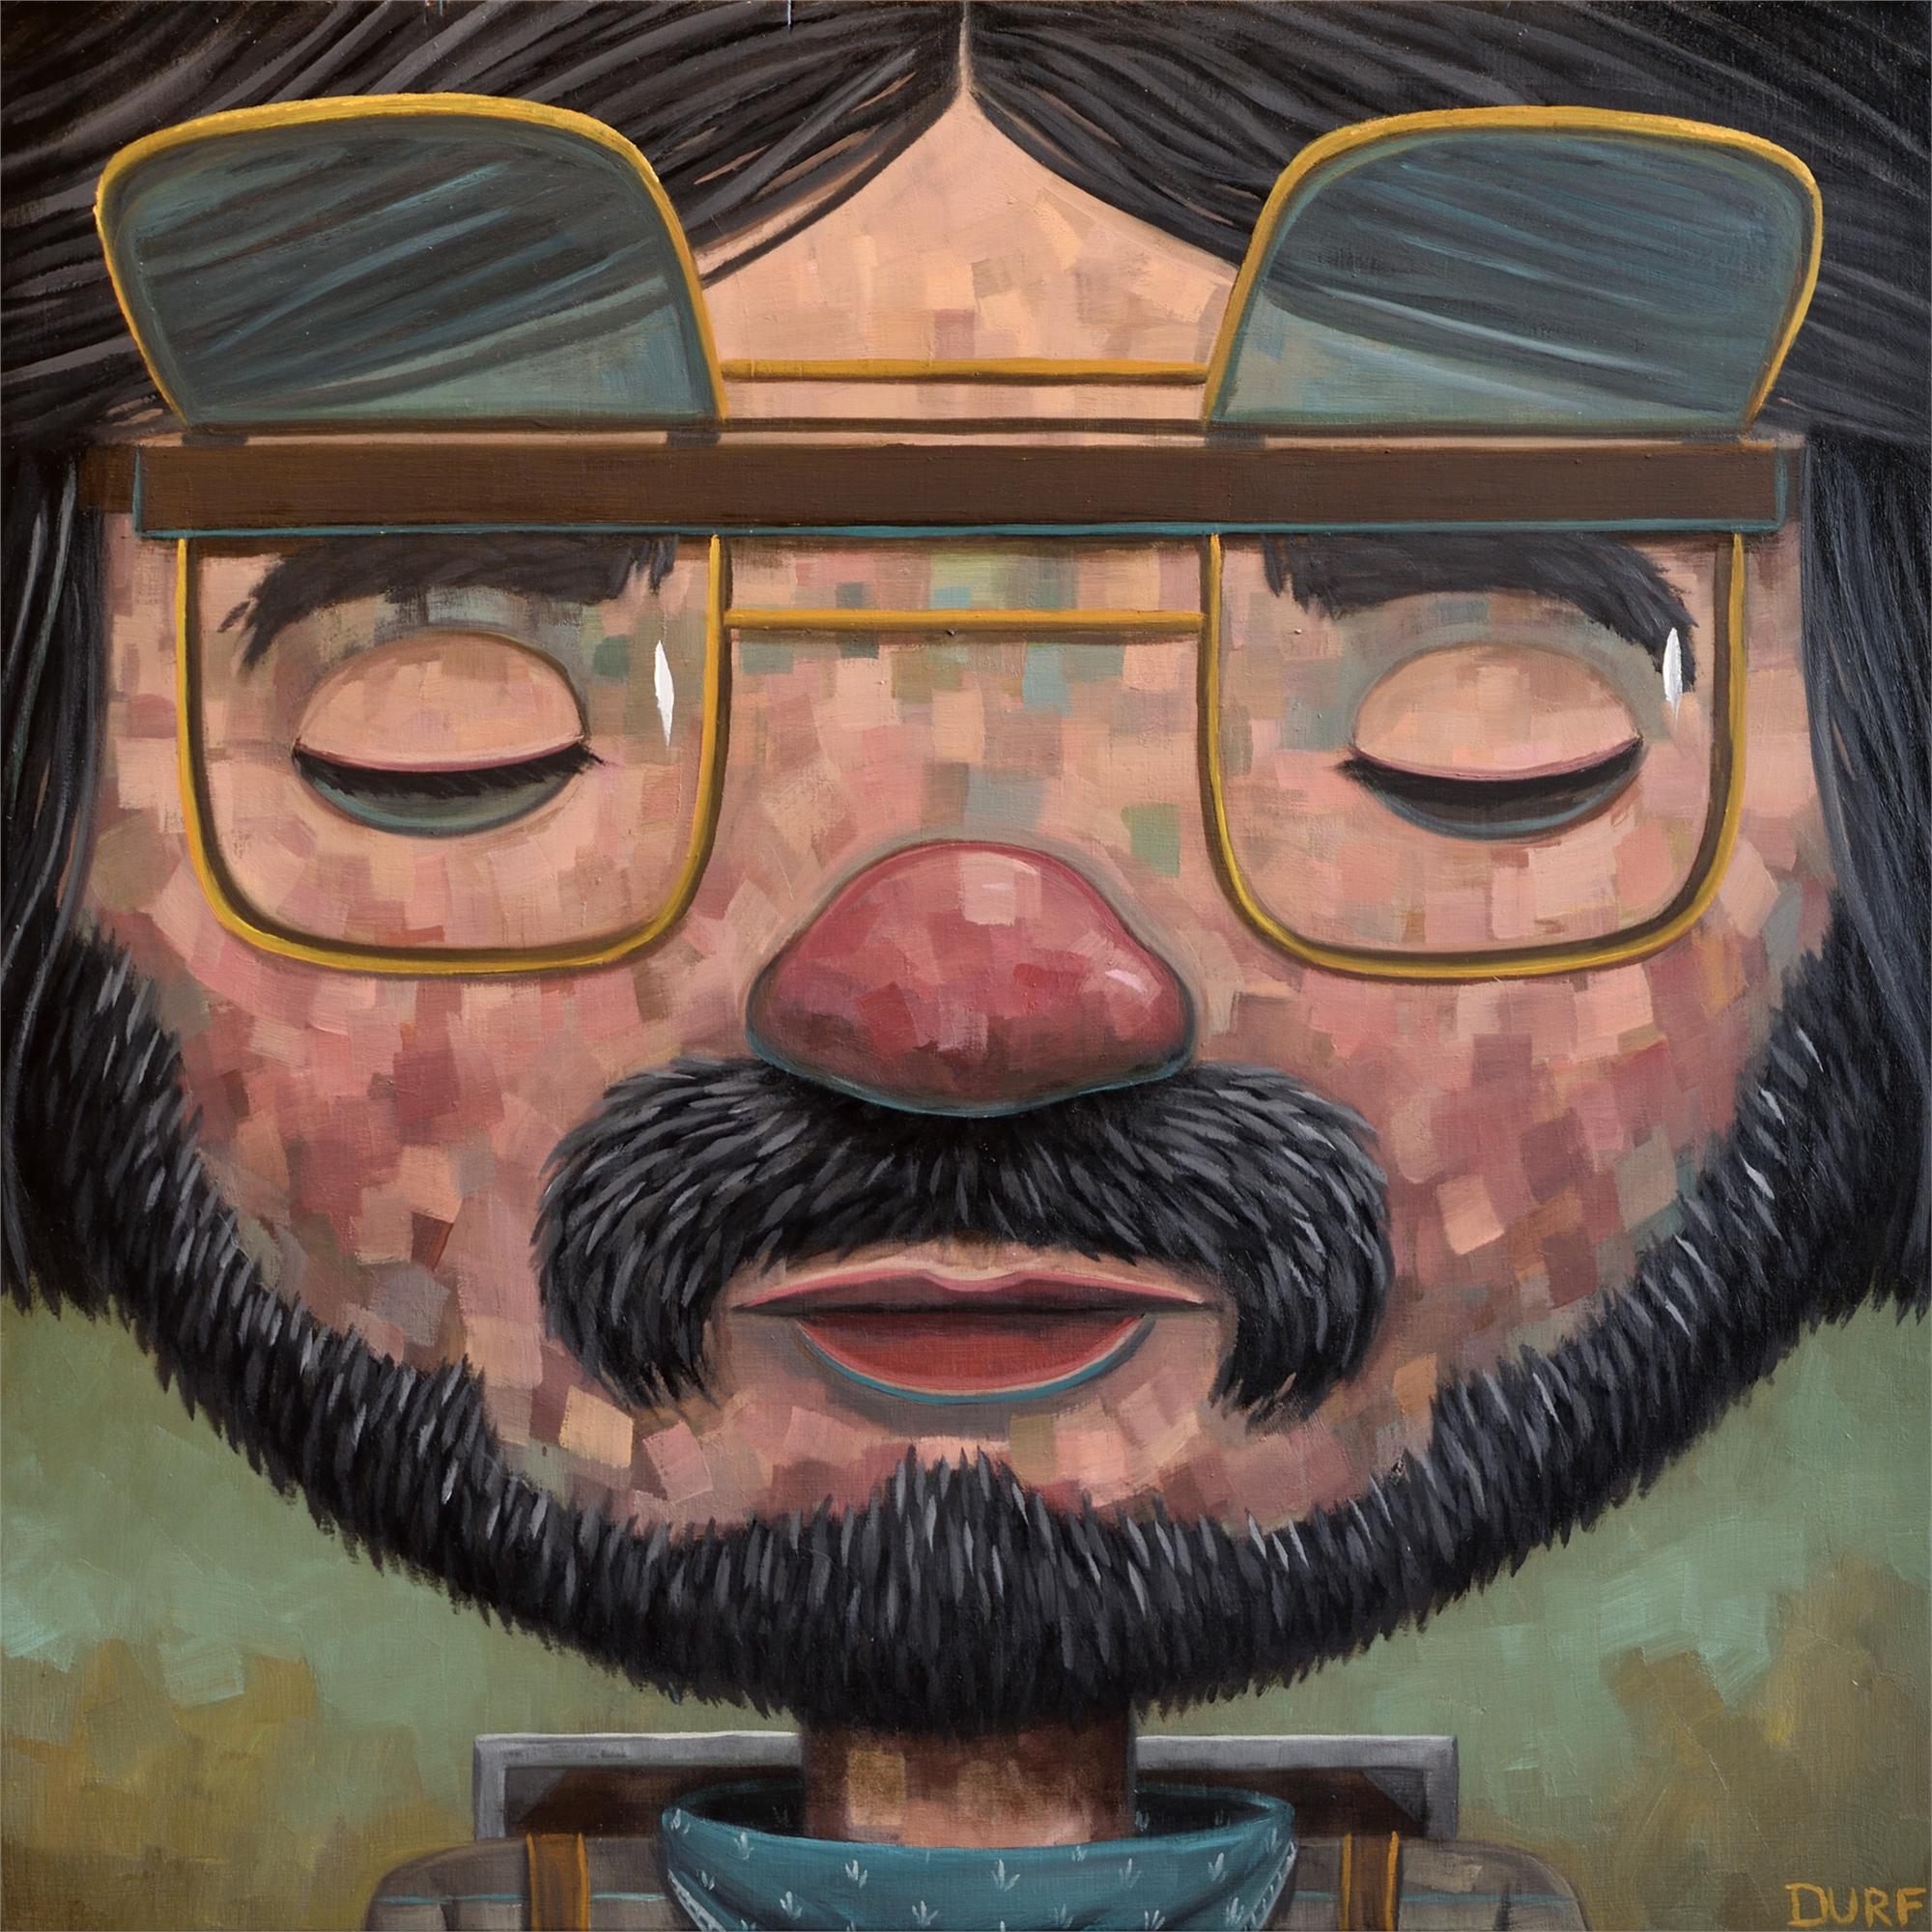 Skyler Dreaming by Nathan Durfee